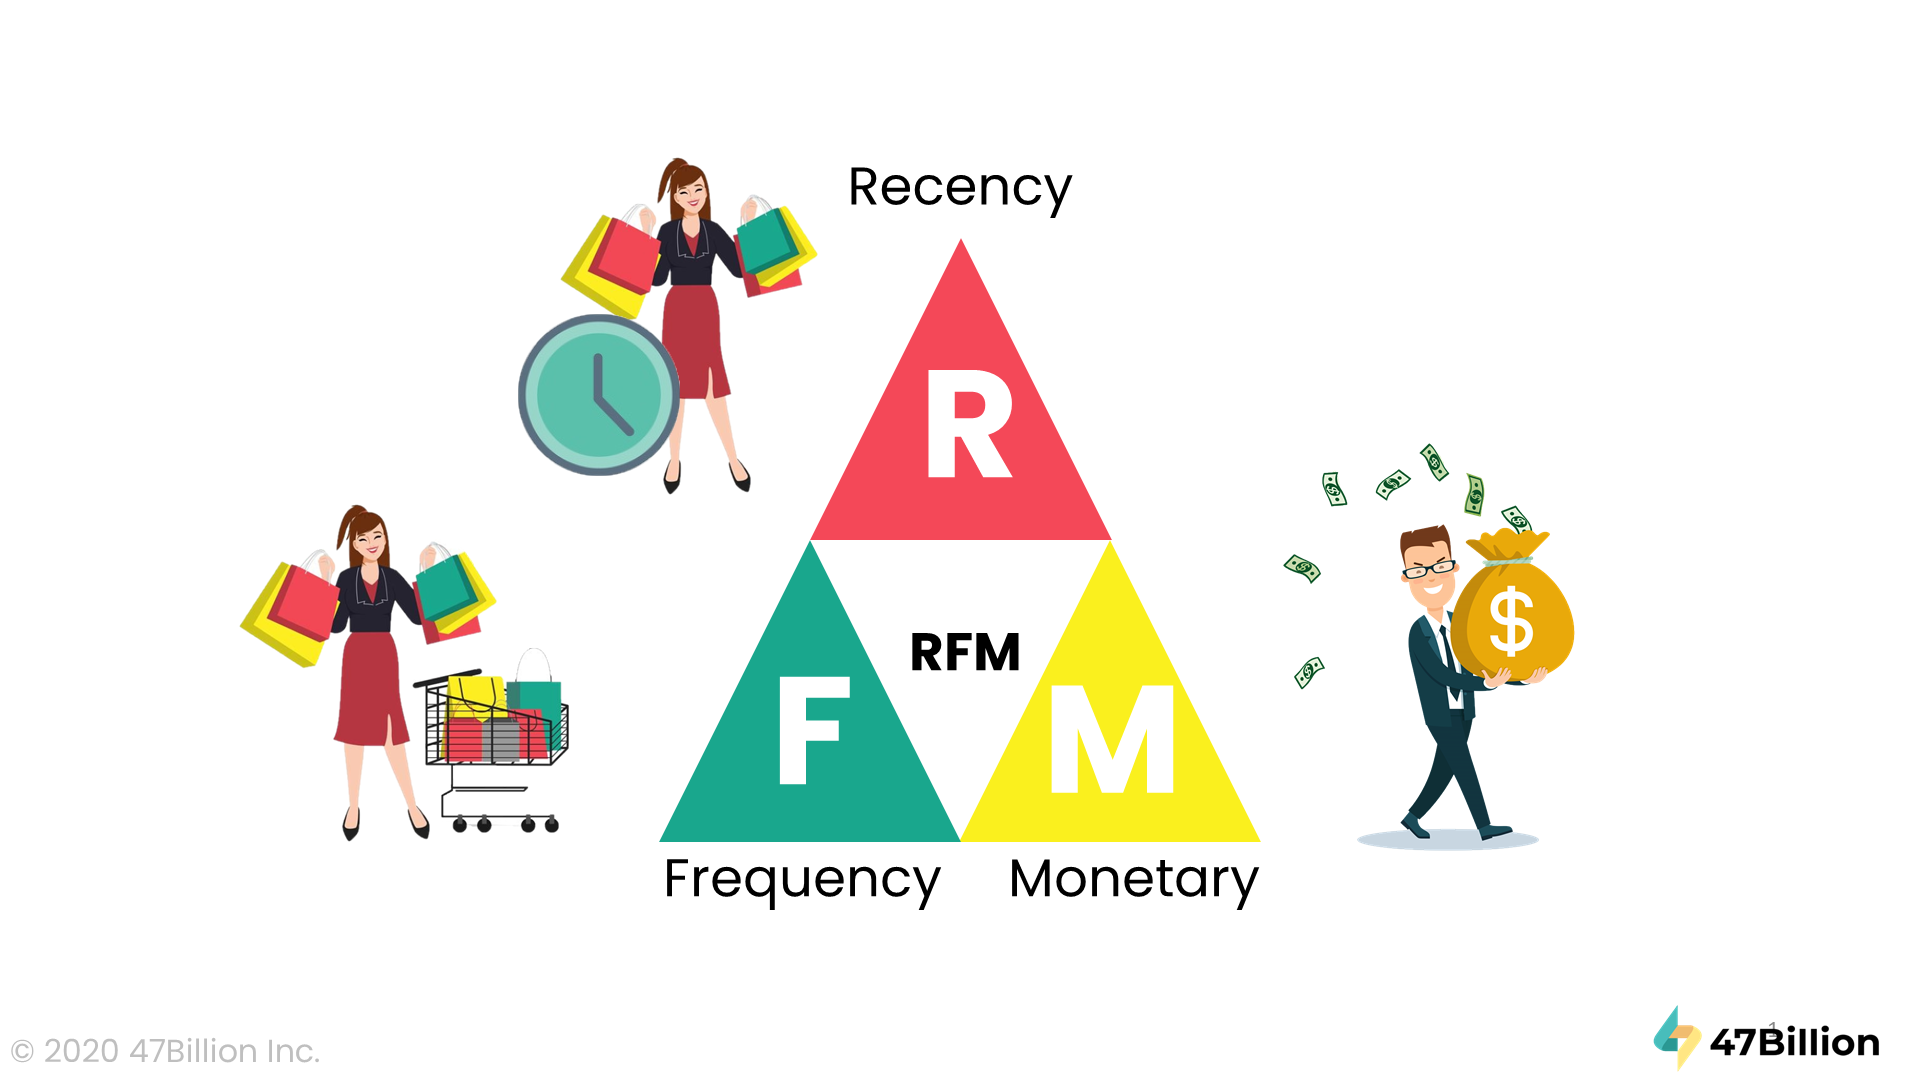 Customer behavioral analytics using Recency, Frequency, Monetary data